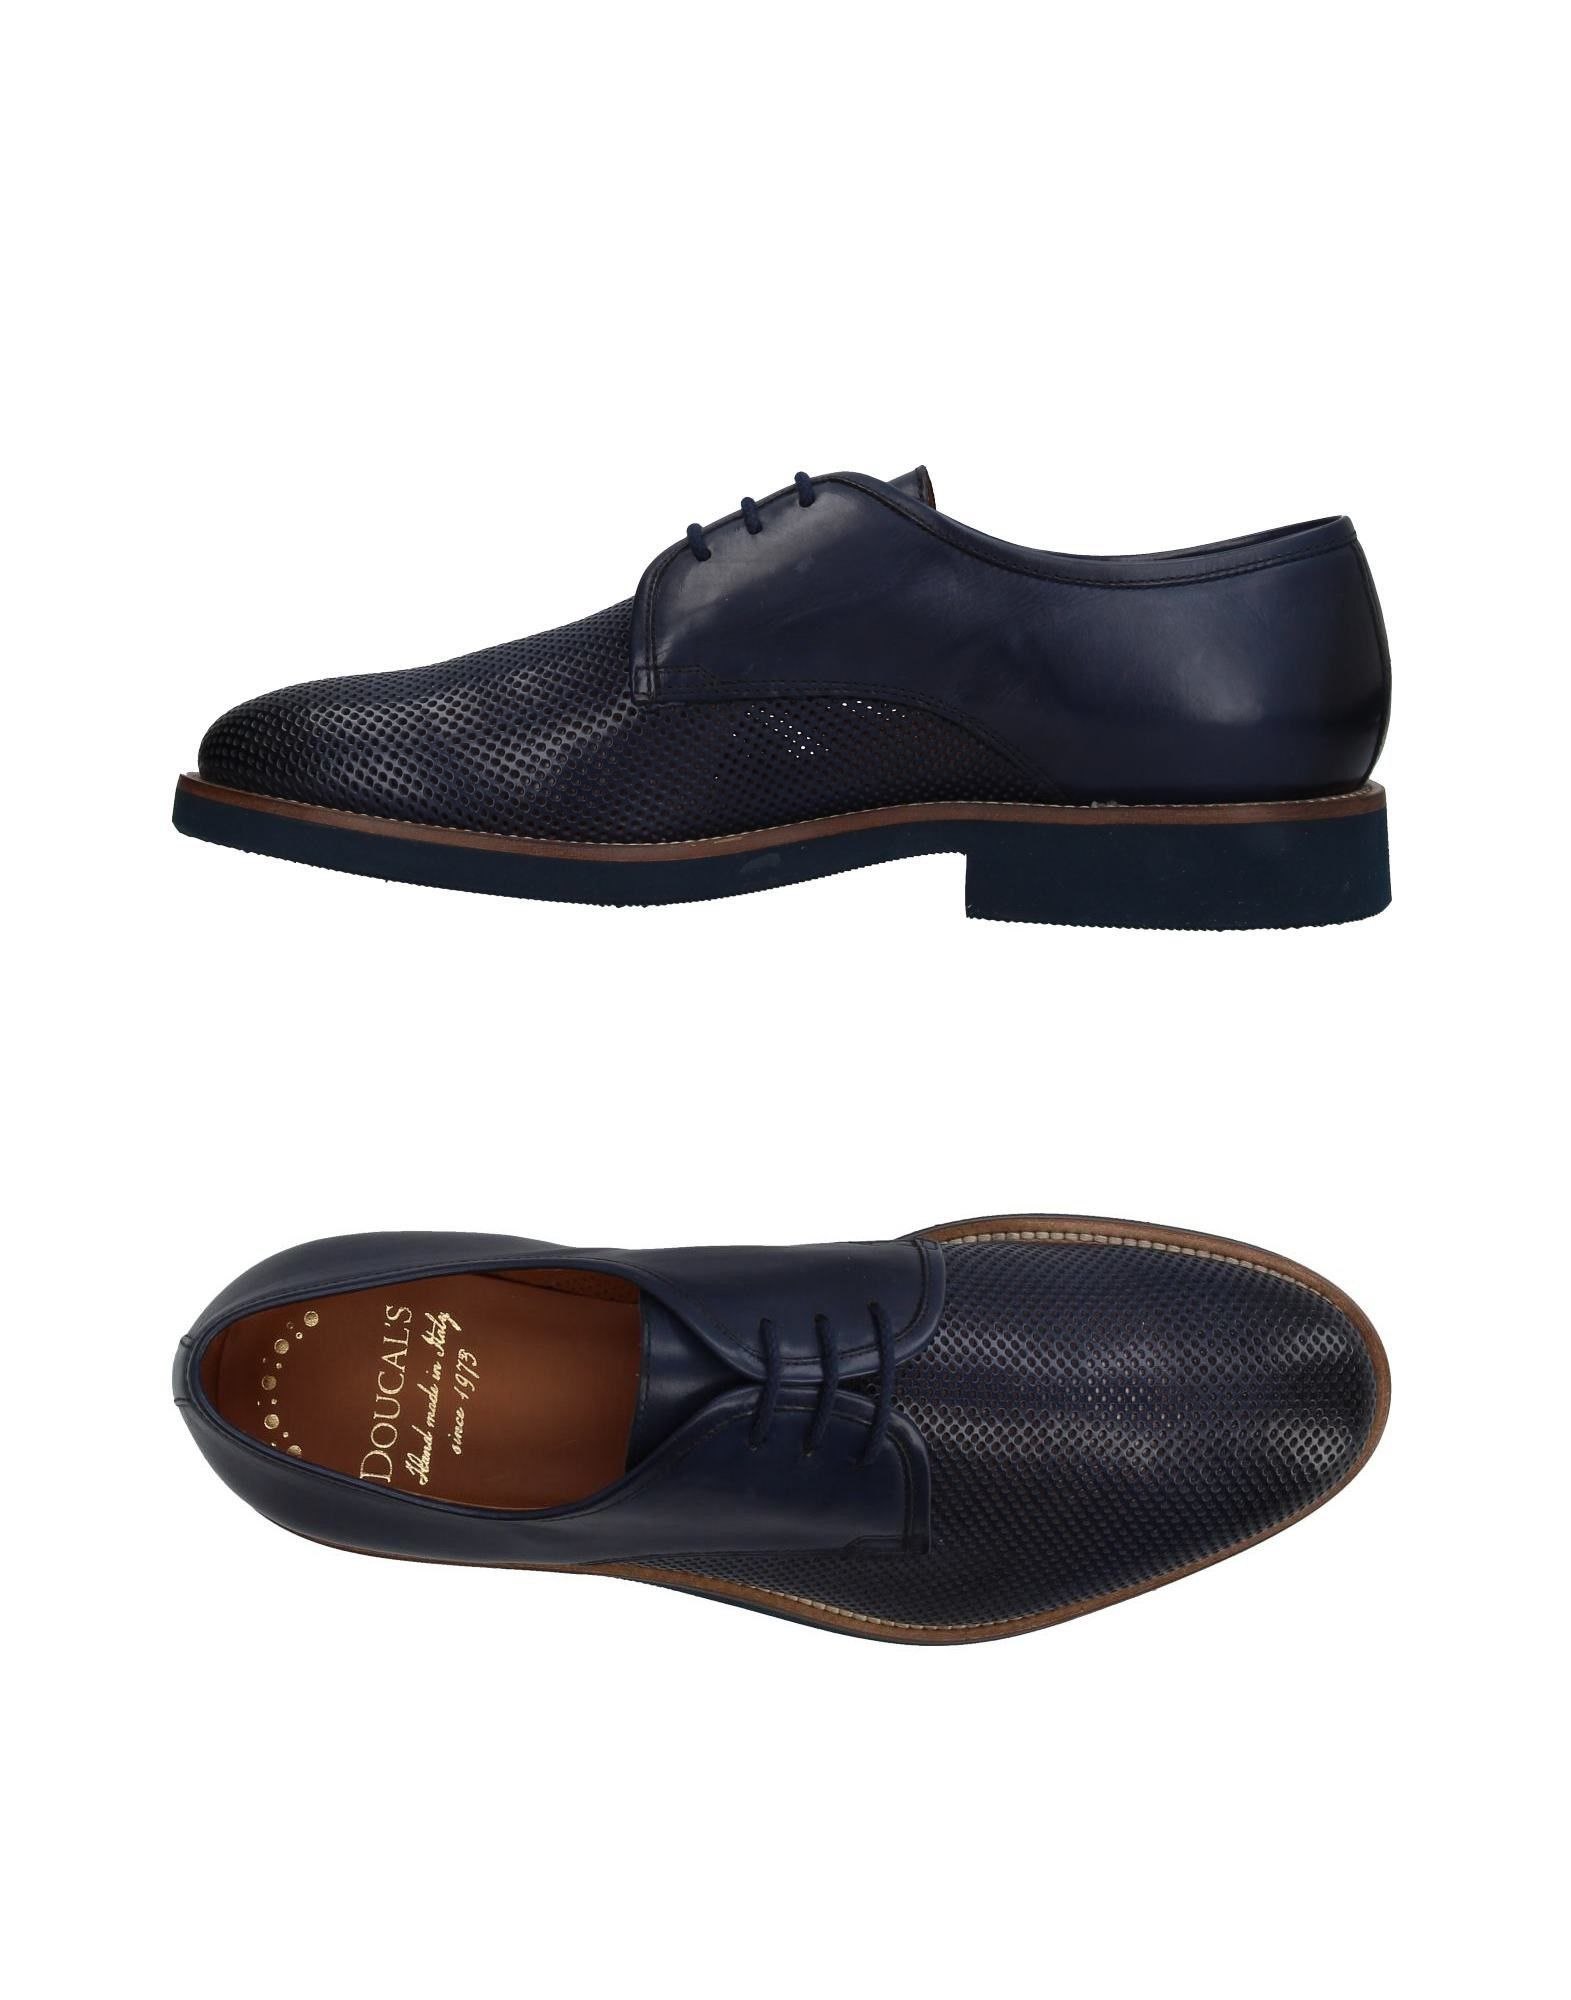 11407610XU Doucal's Schnürschuhe Herren  11407610XU  Heiße Schuhe e9fb78